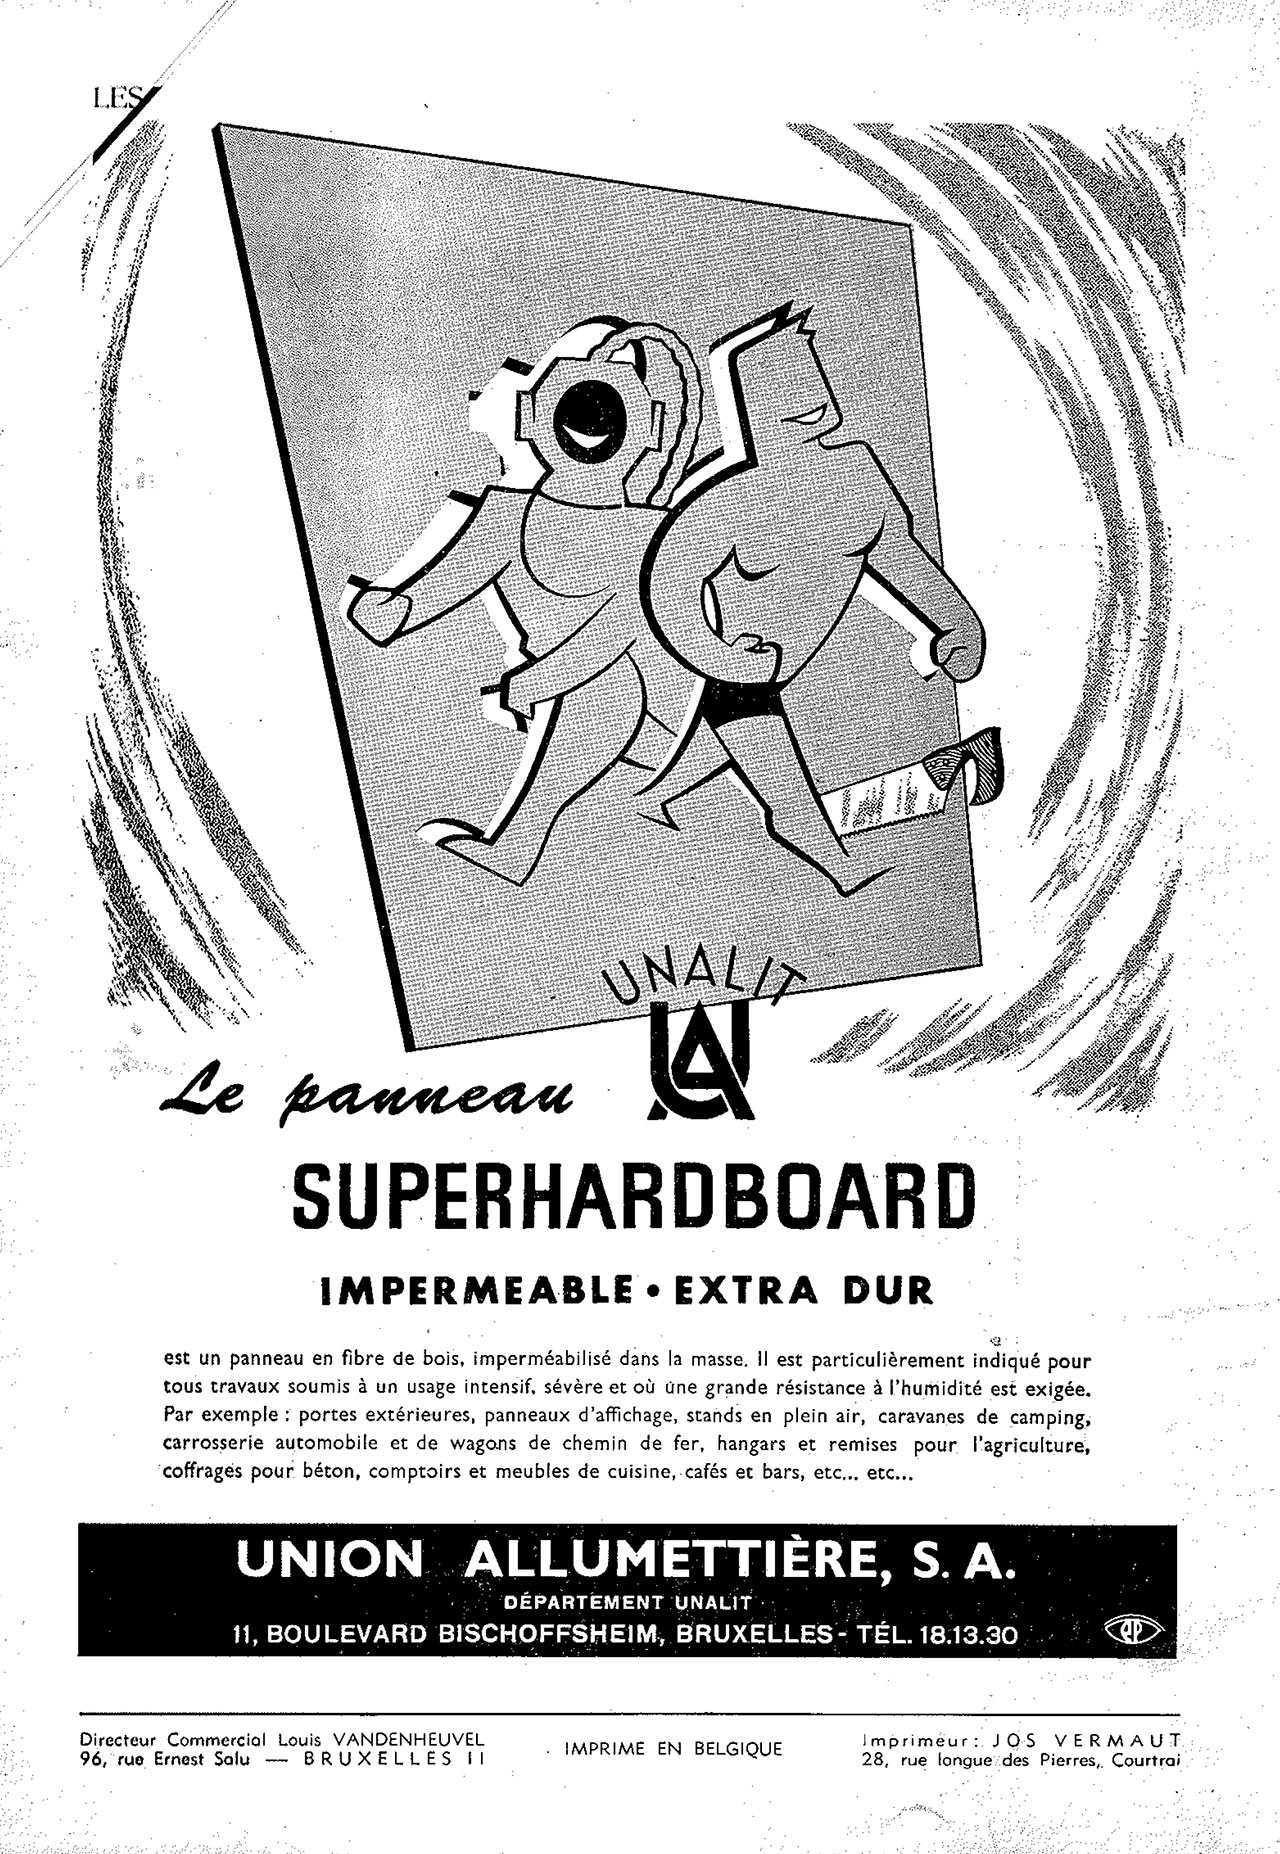 Unalit Panneau Superhardboard